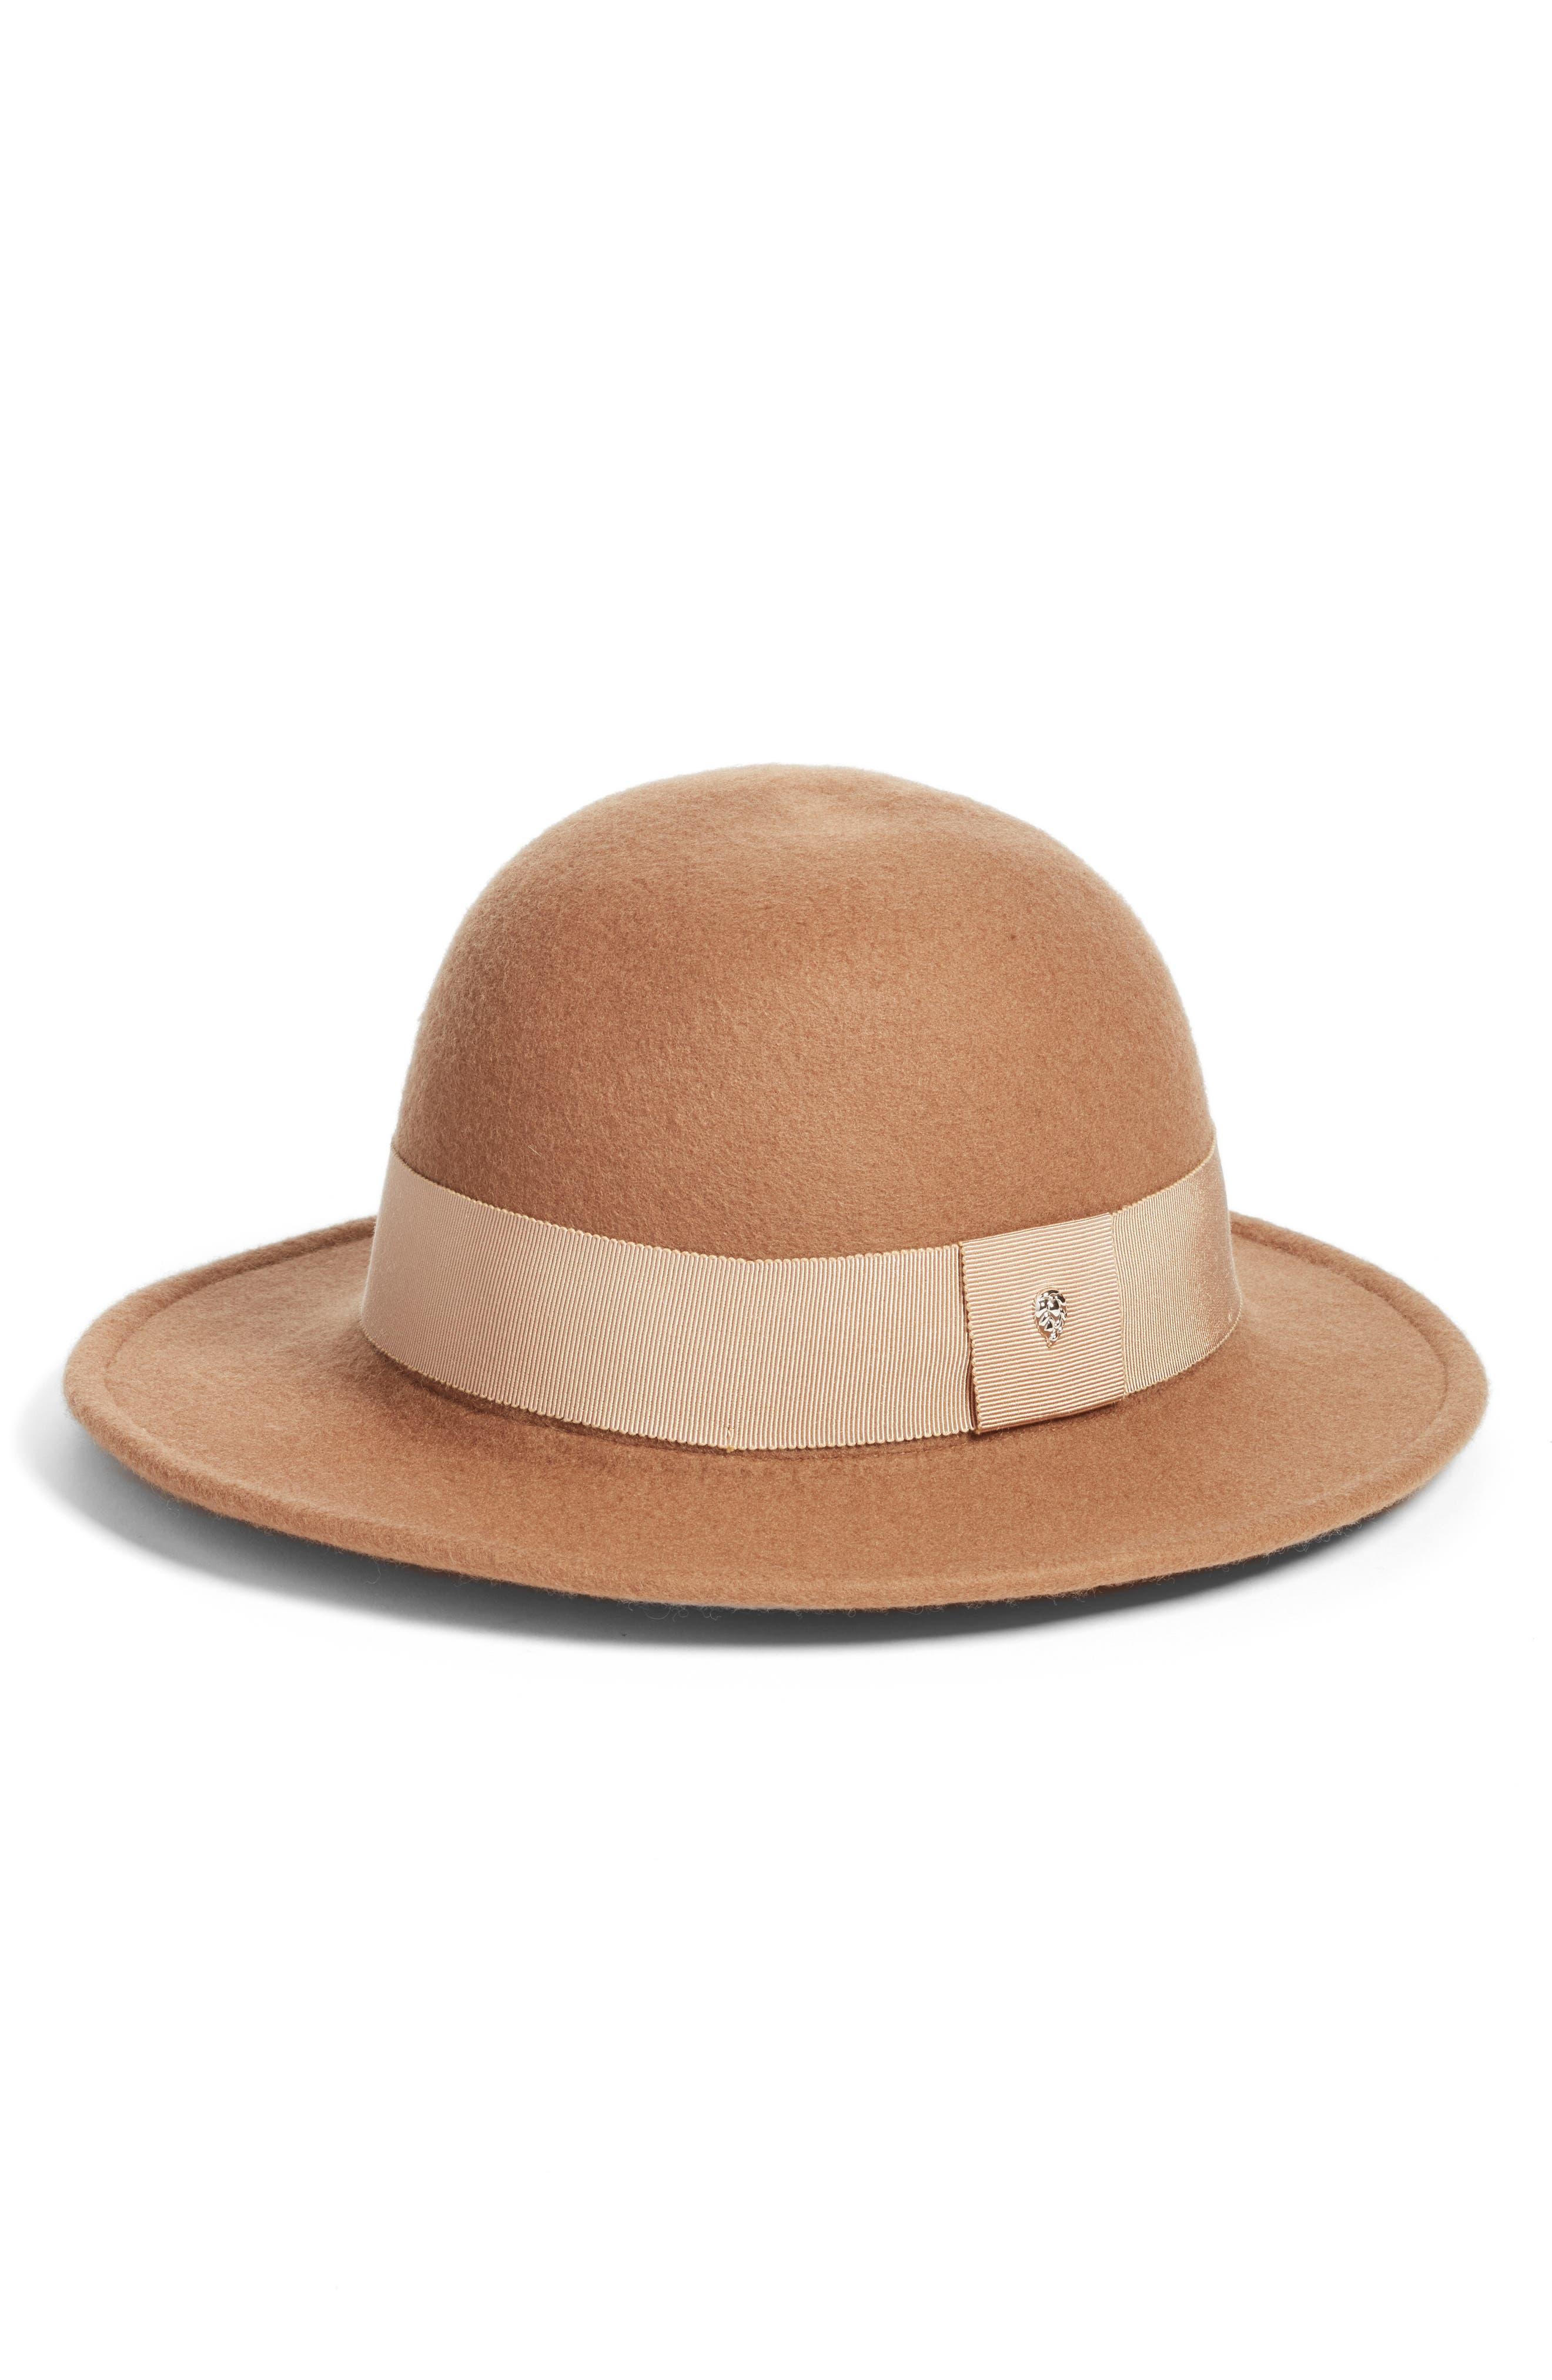 Main Image - Helen Kaminski Wool Felt Round Hat